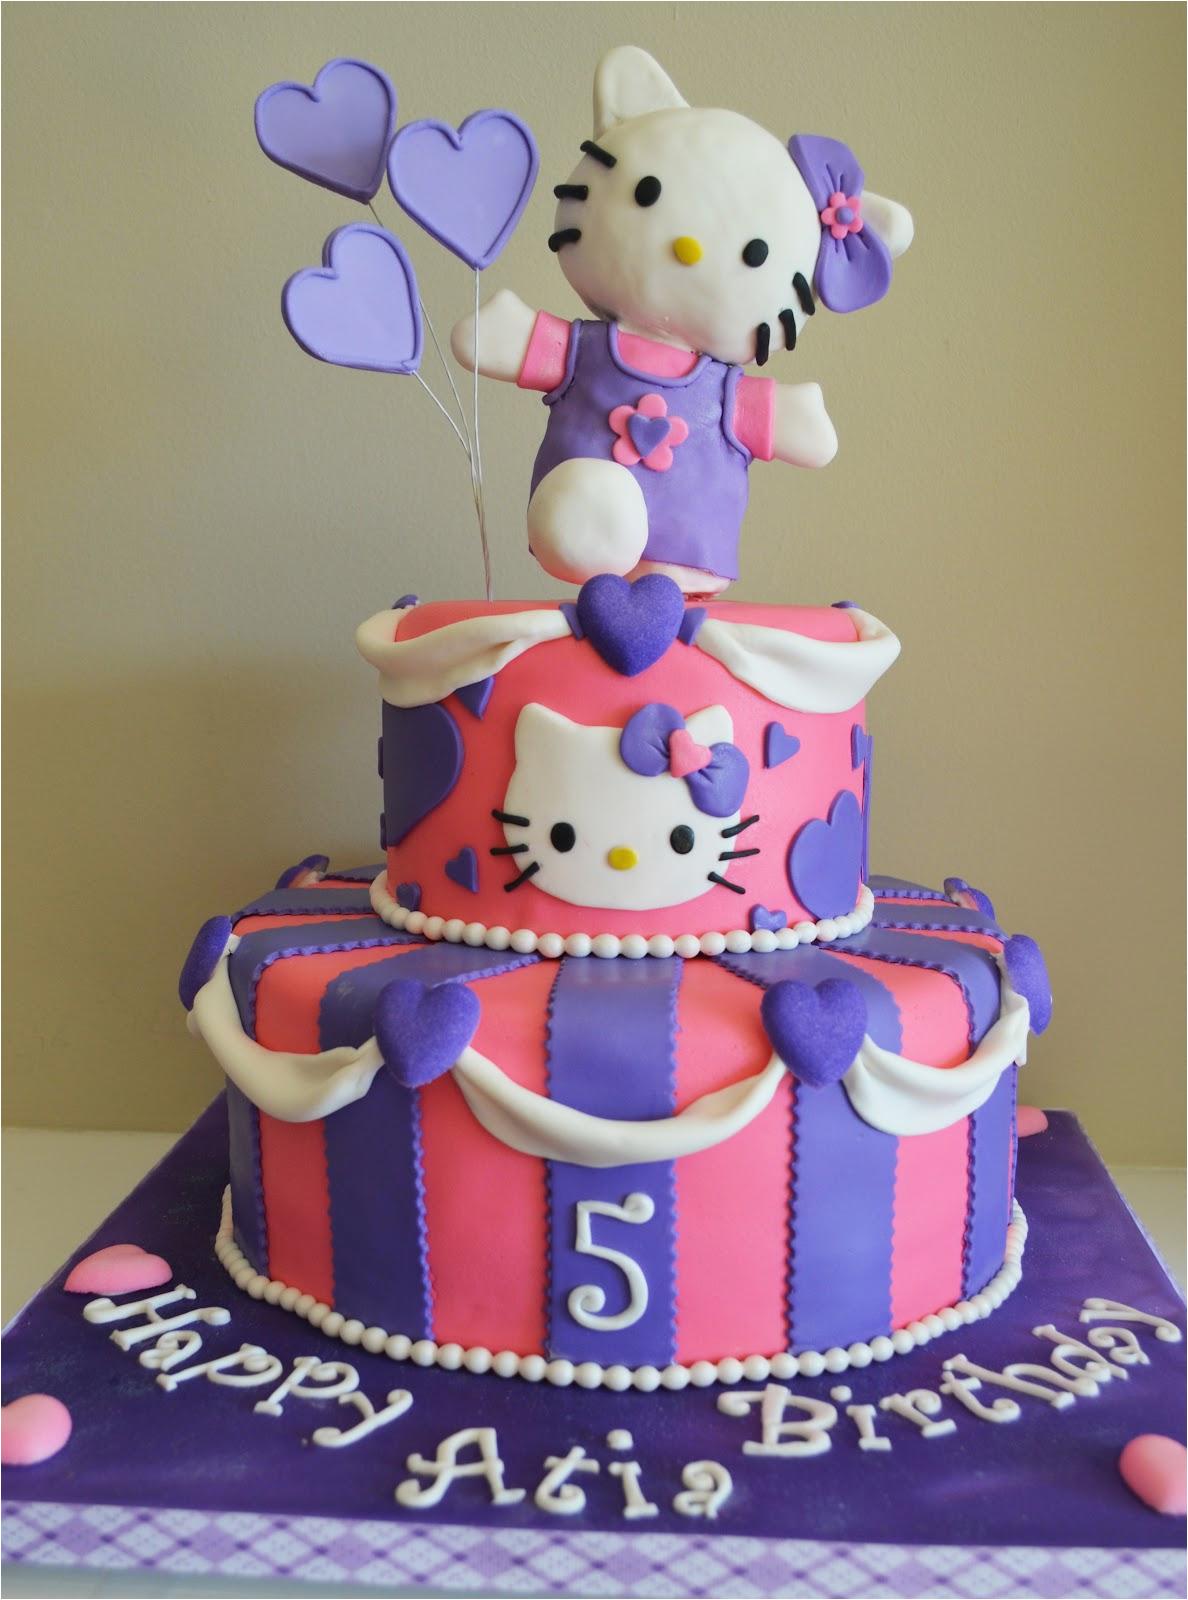 Hello Kitty Birthday Cake Decorations 30 Cute Ideas And Designs Echomon